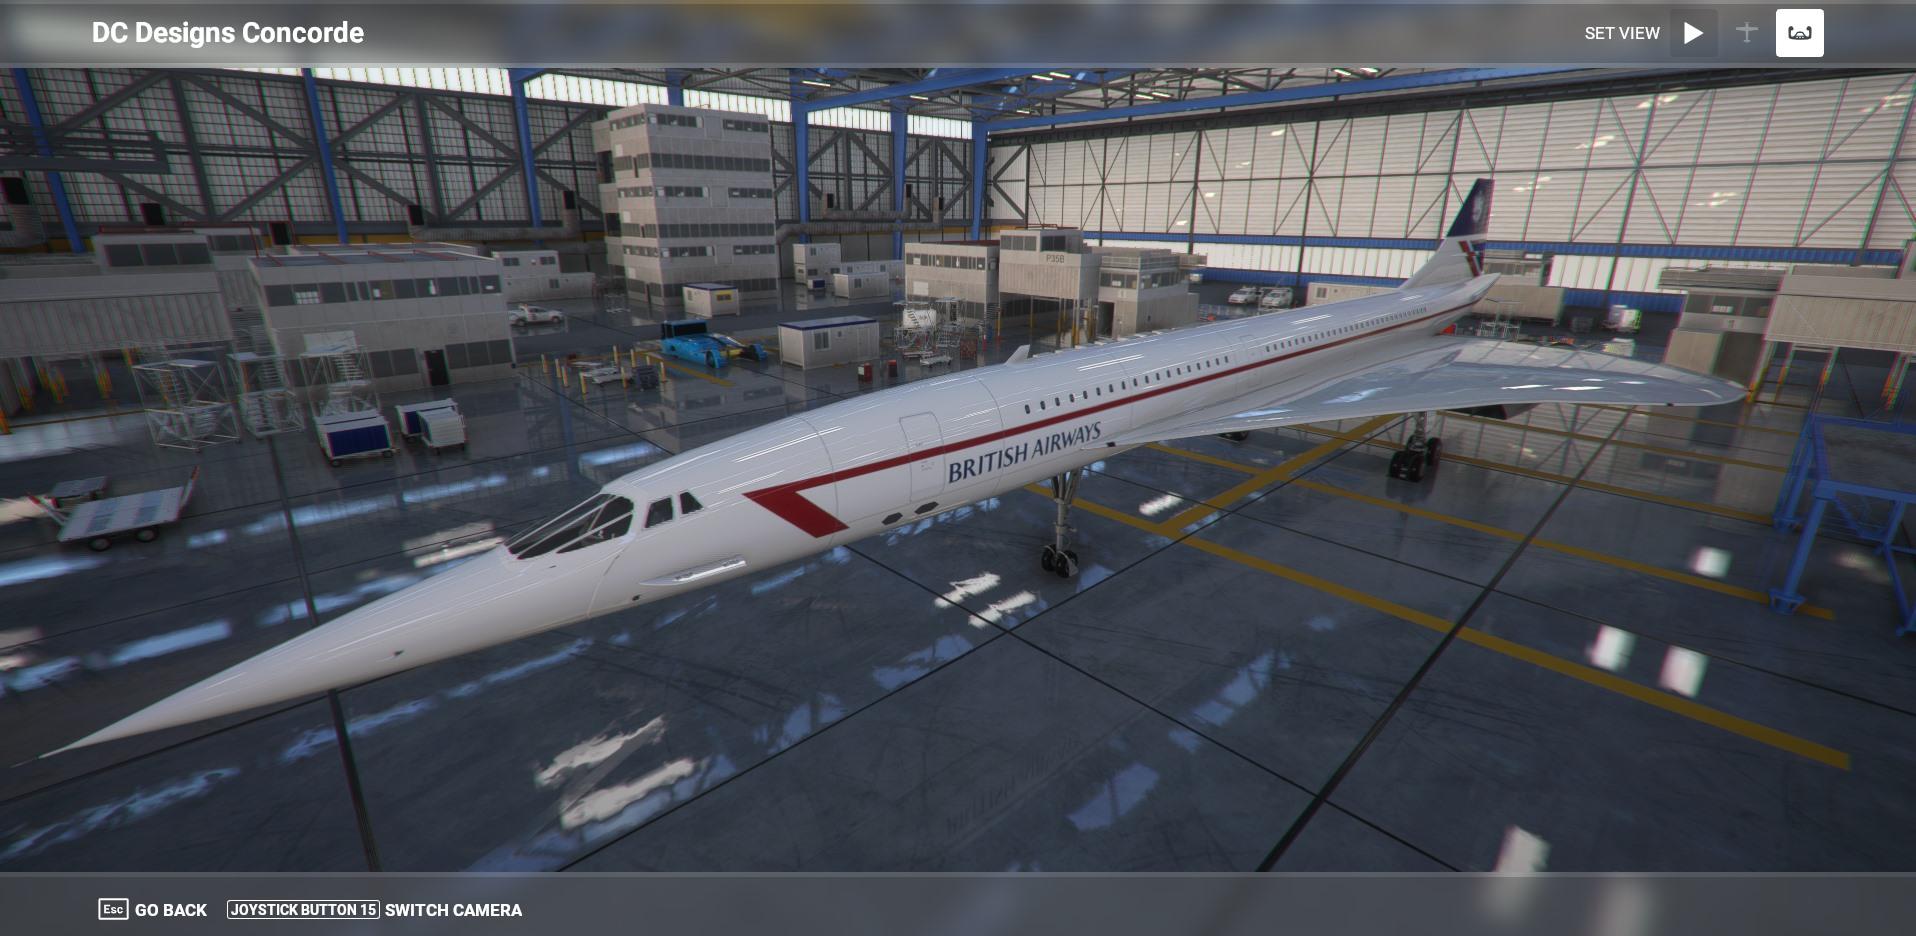 Microsoft Flight Simulator Concorde